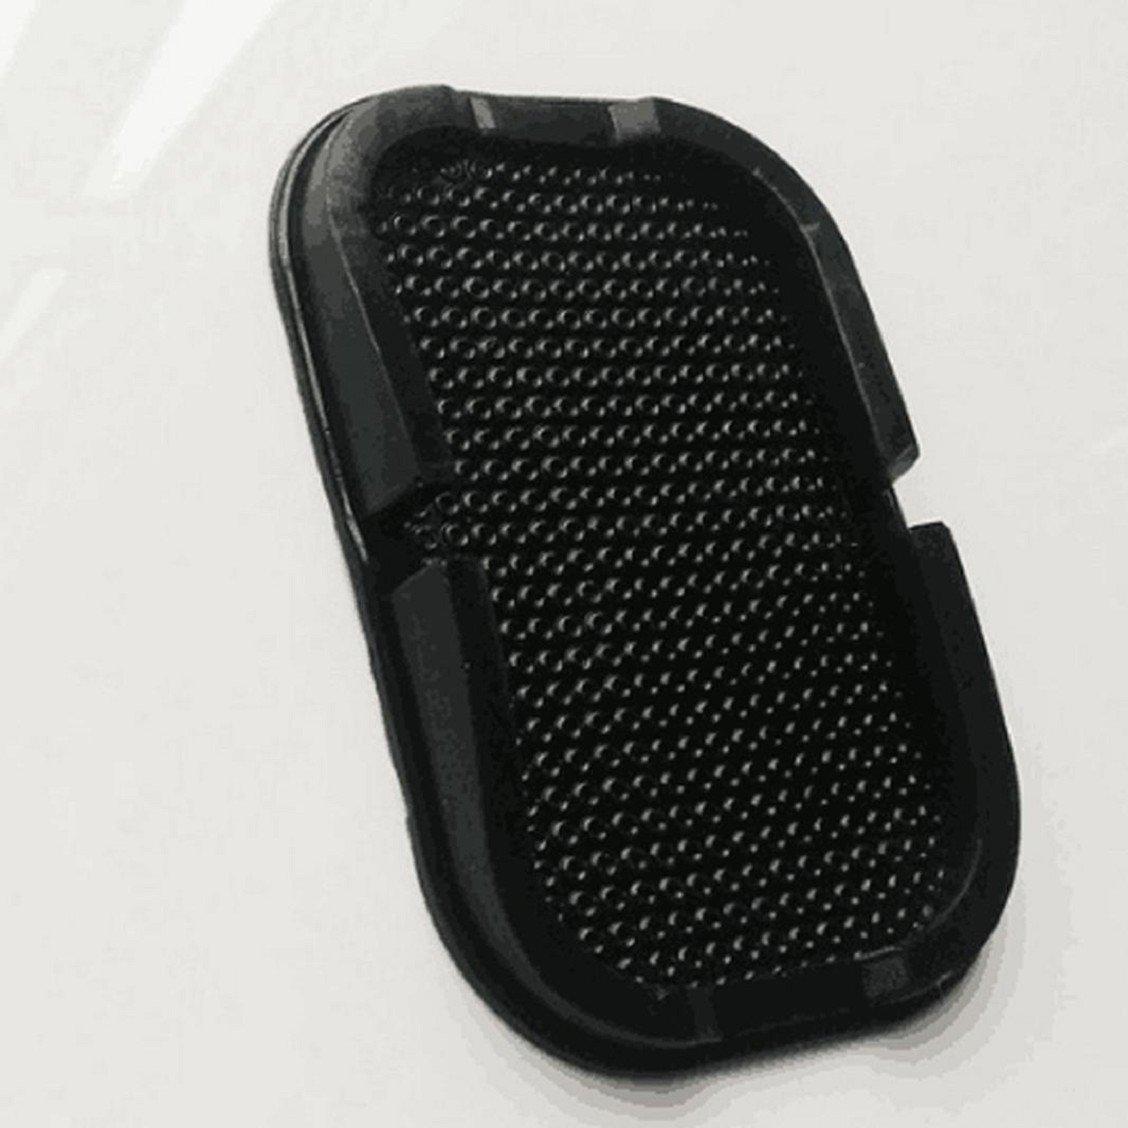 Naladoo Anti-Slip Car Sticky Pad Mat Mobile Phone Sticky accessories Mount Stick Holder by Naladoo (Image #3)